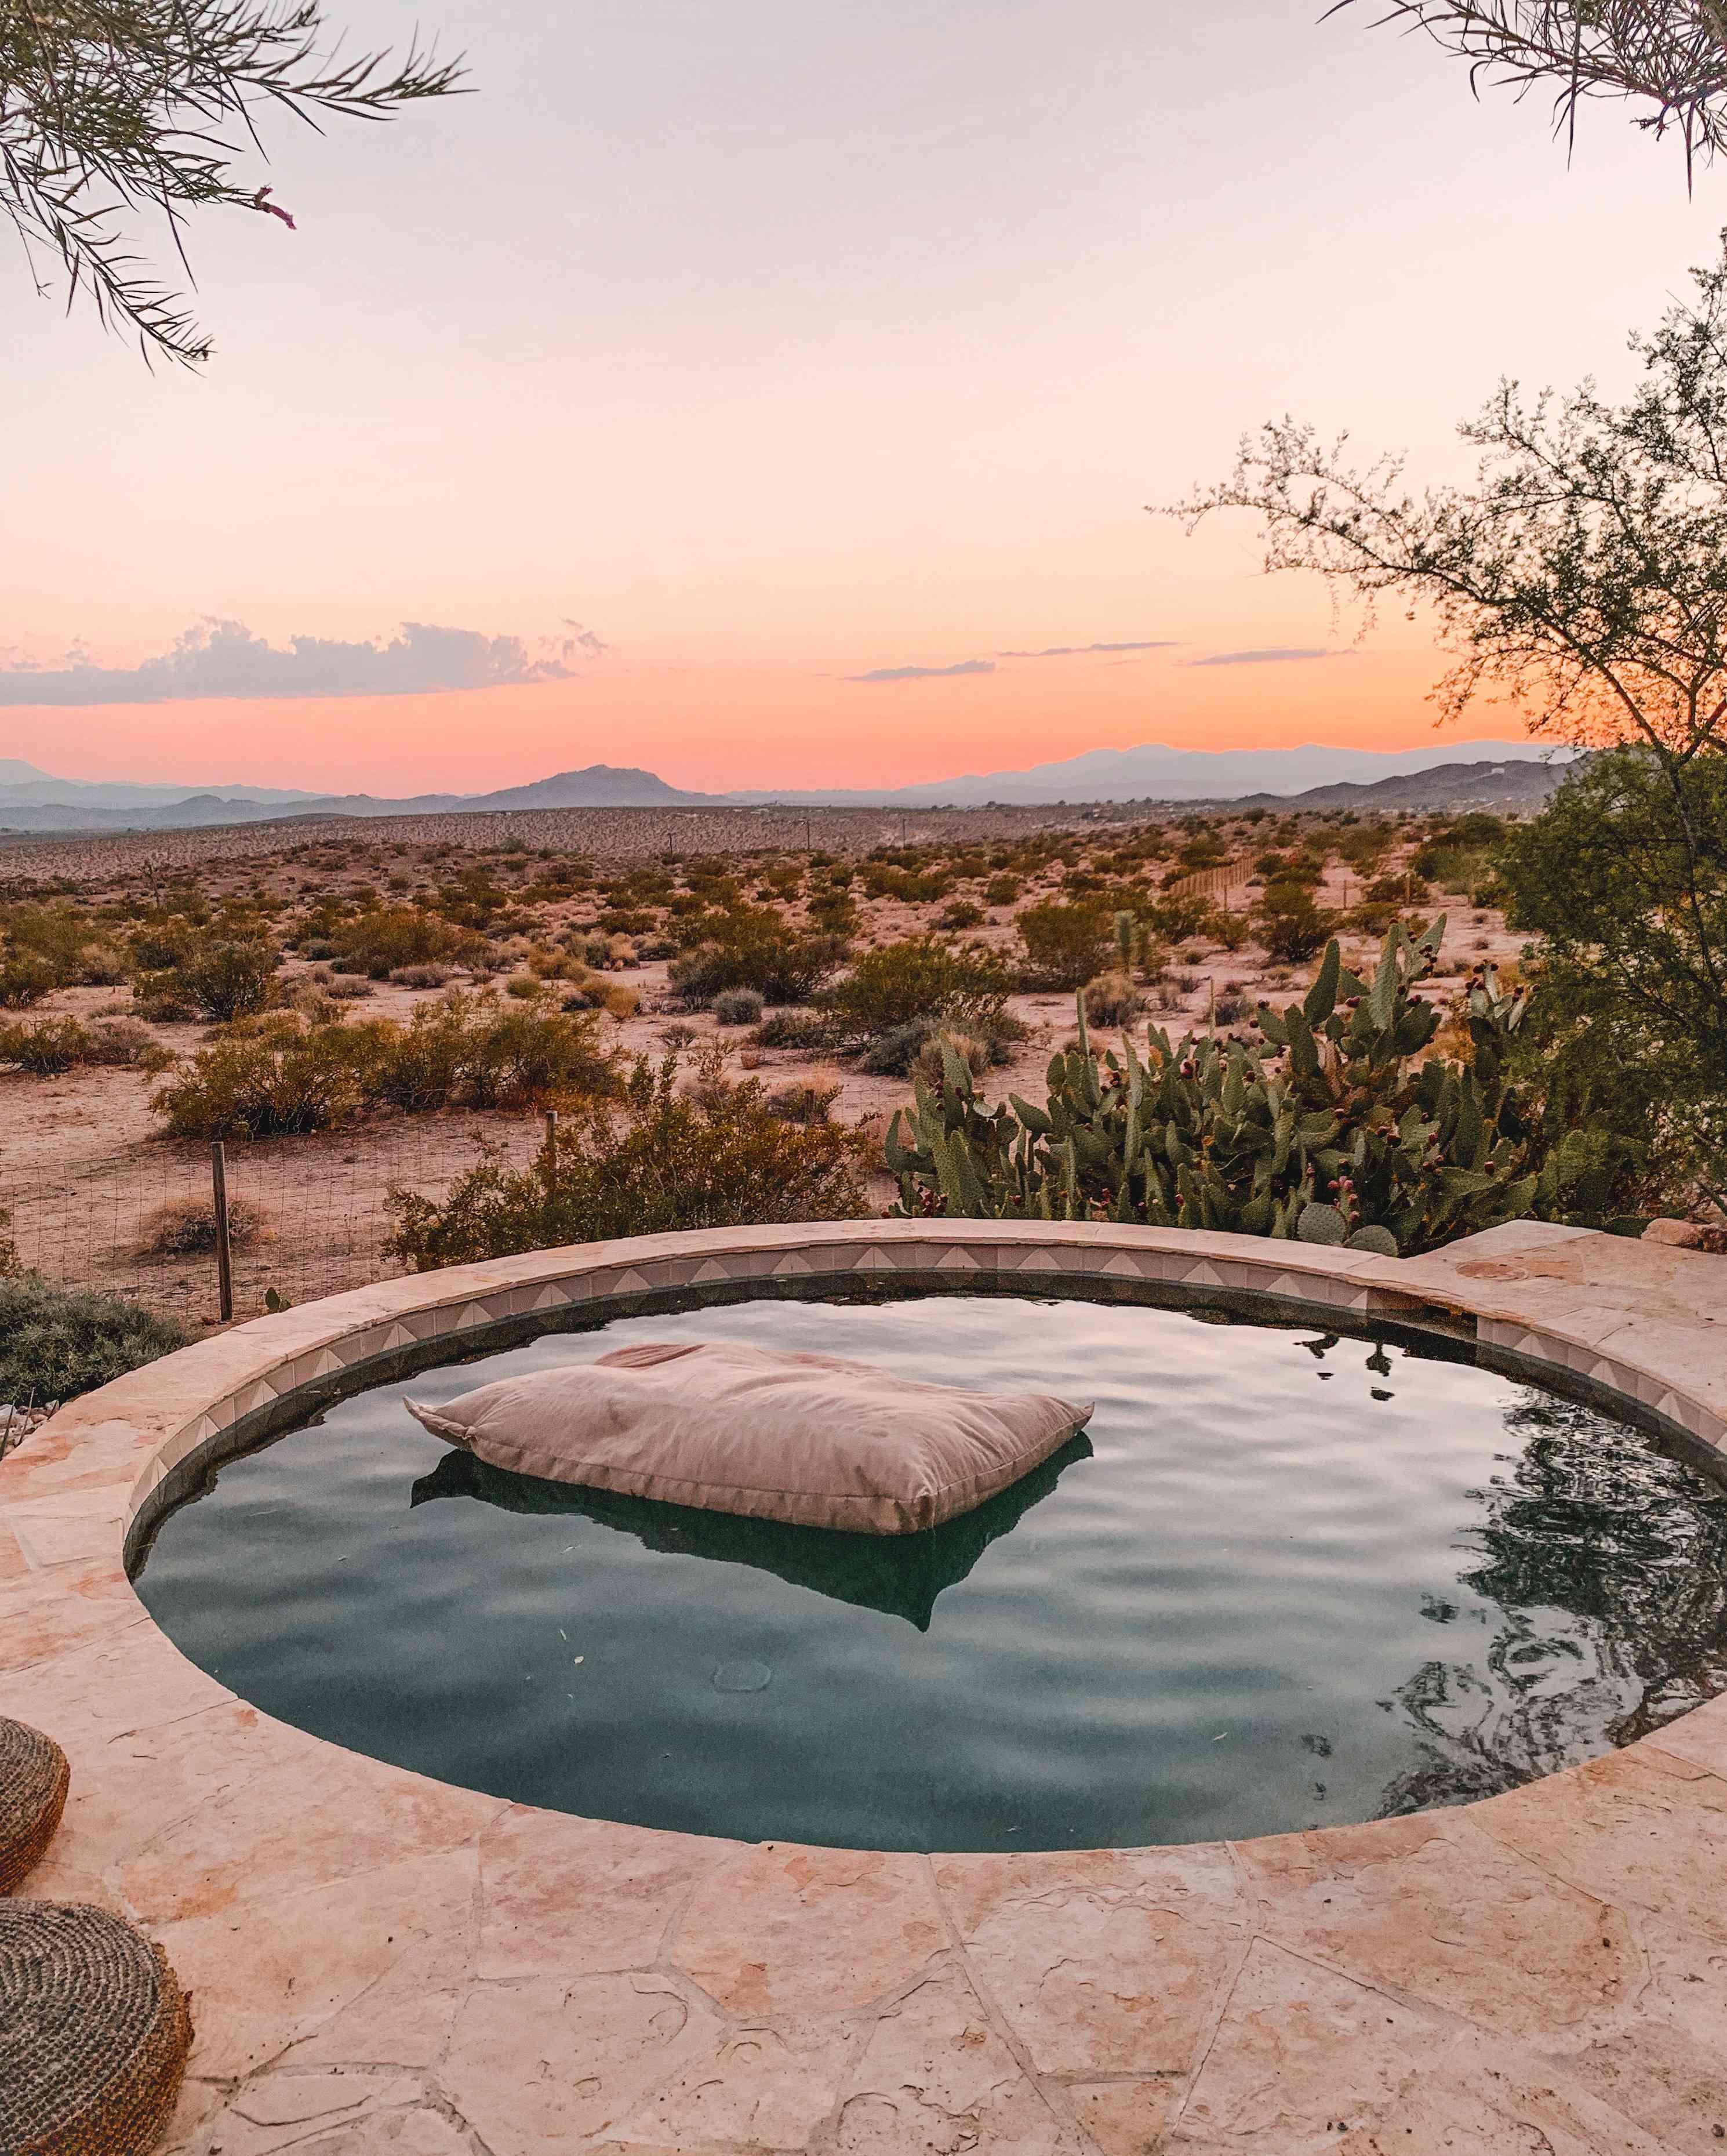 Spa-like hot tub at The Joshua Tree House